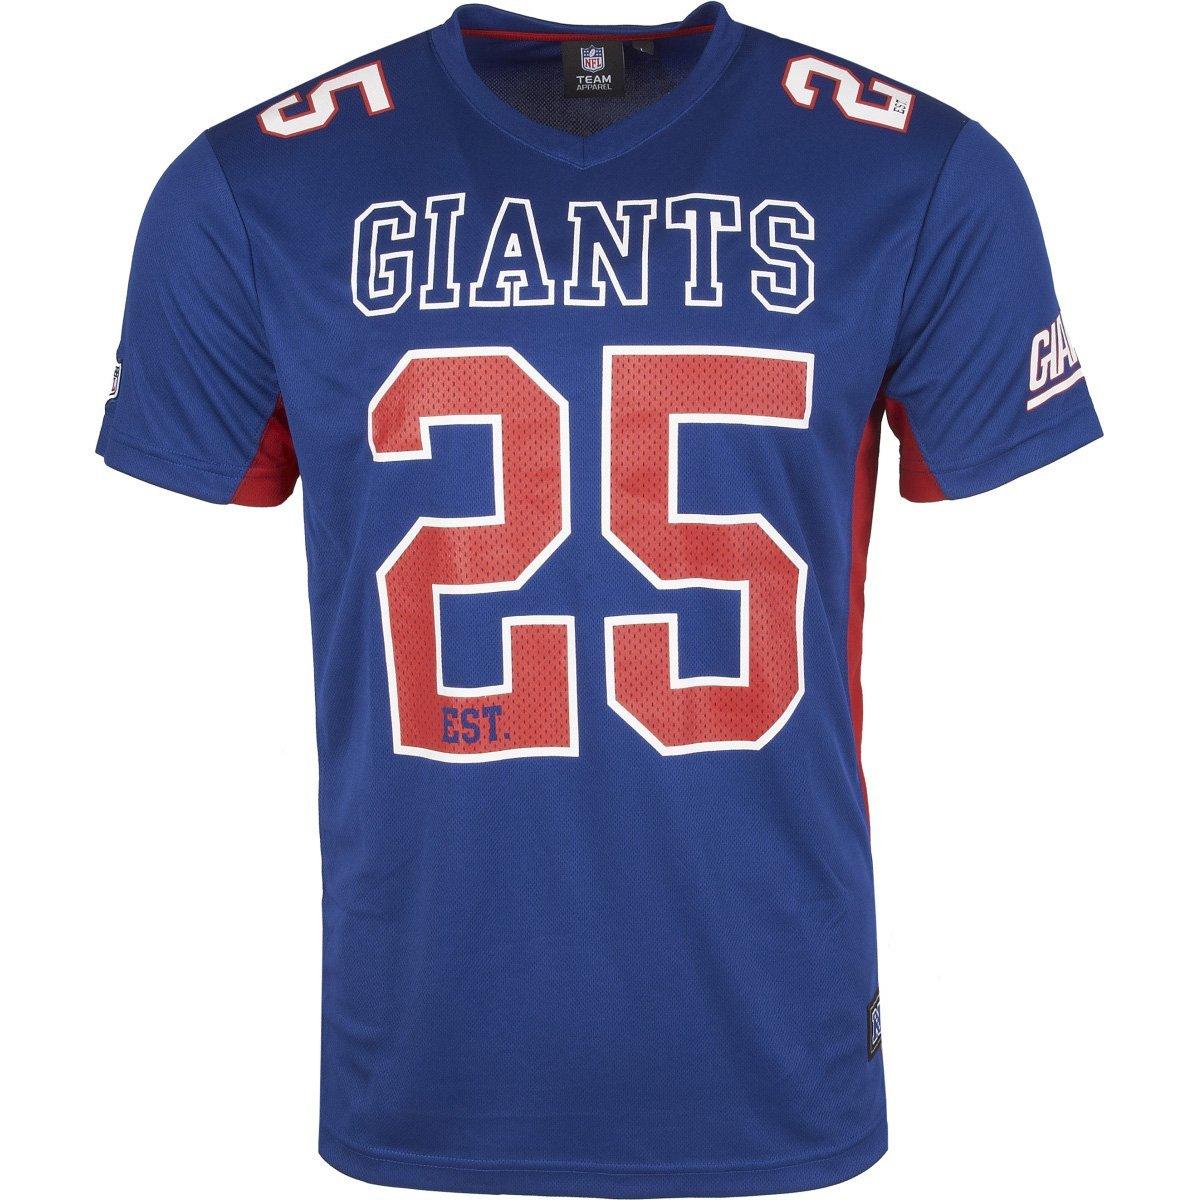 Majestic New York Giants Moro Est. 25 Mesh Jersey NFL T-Shirt majestic athletics